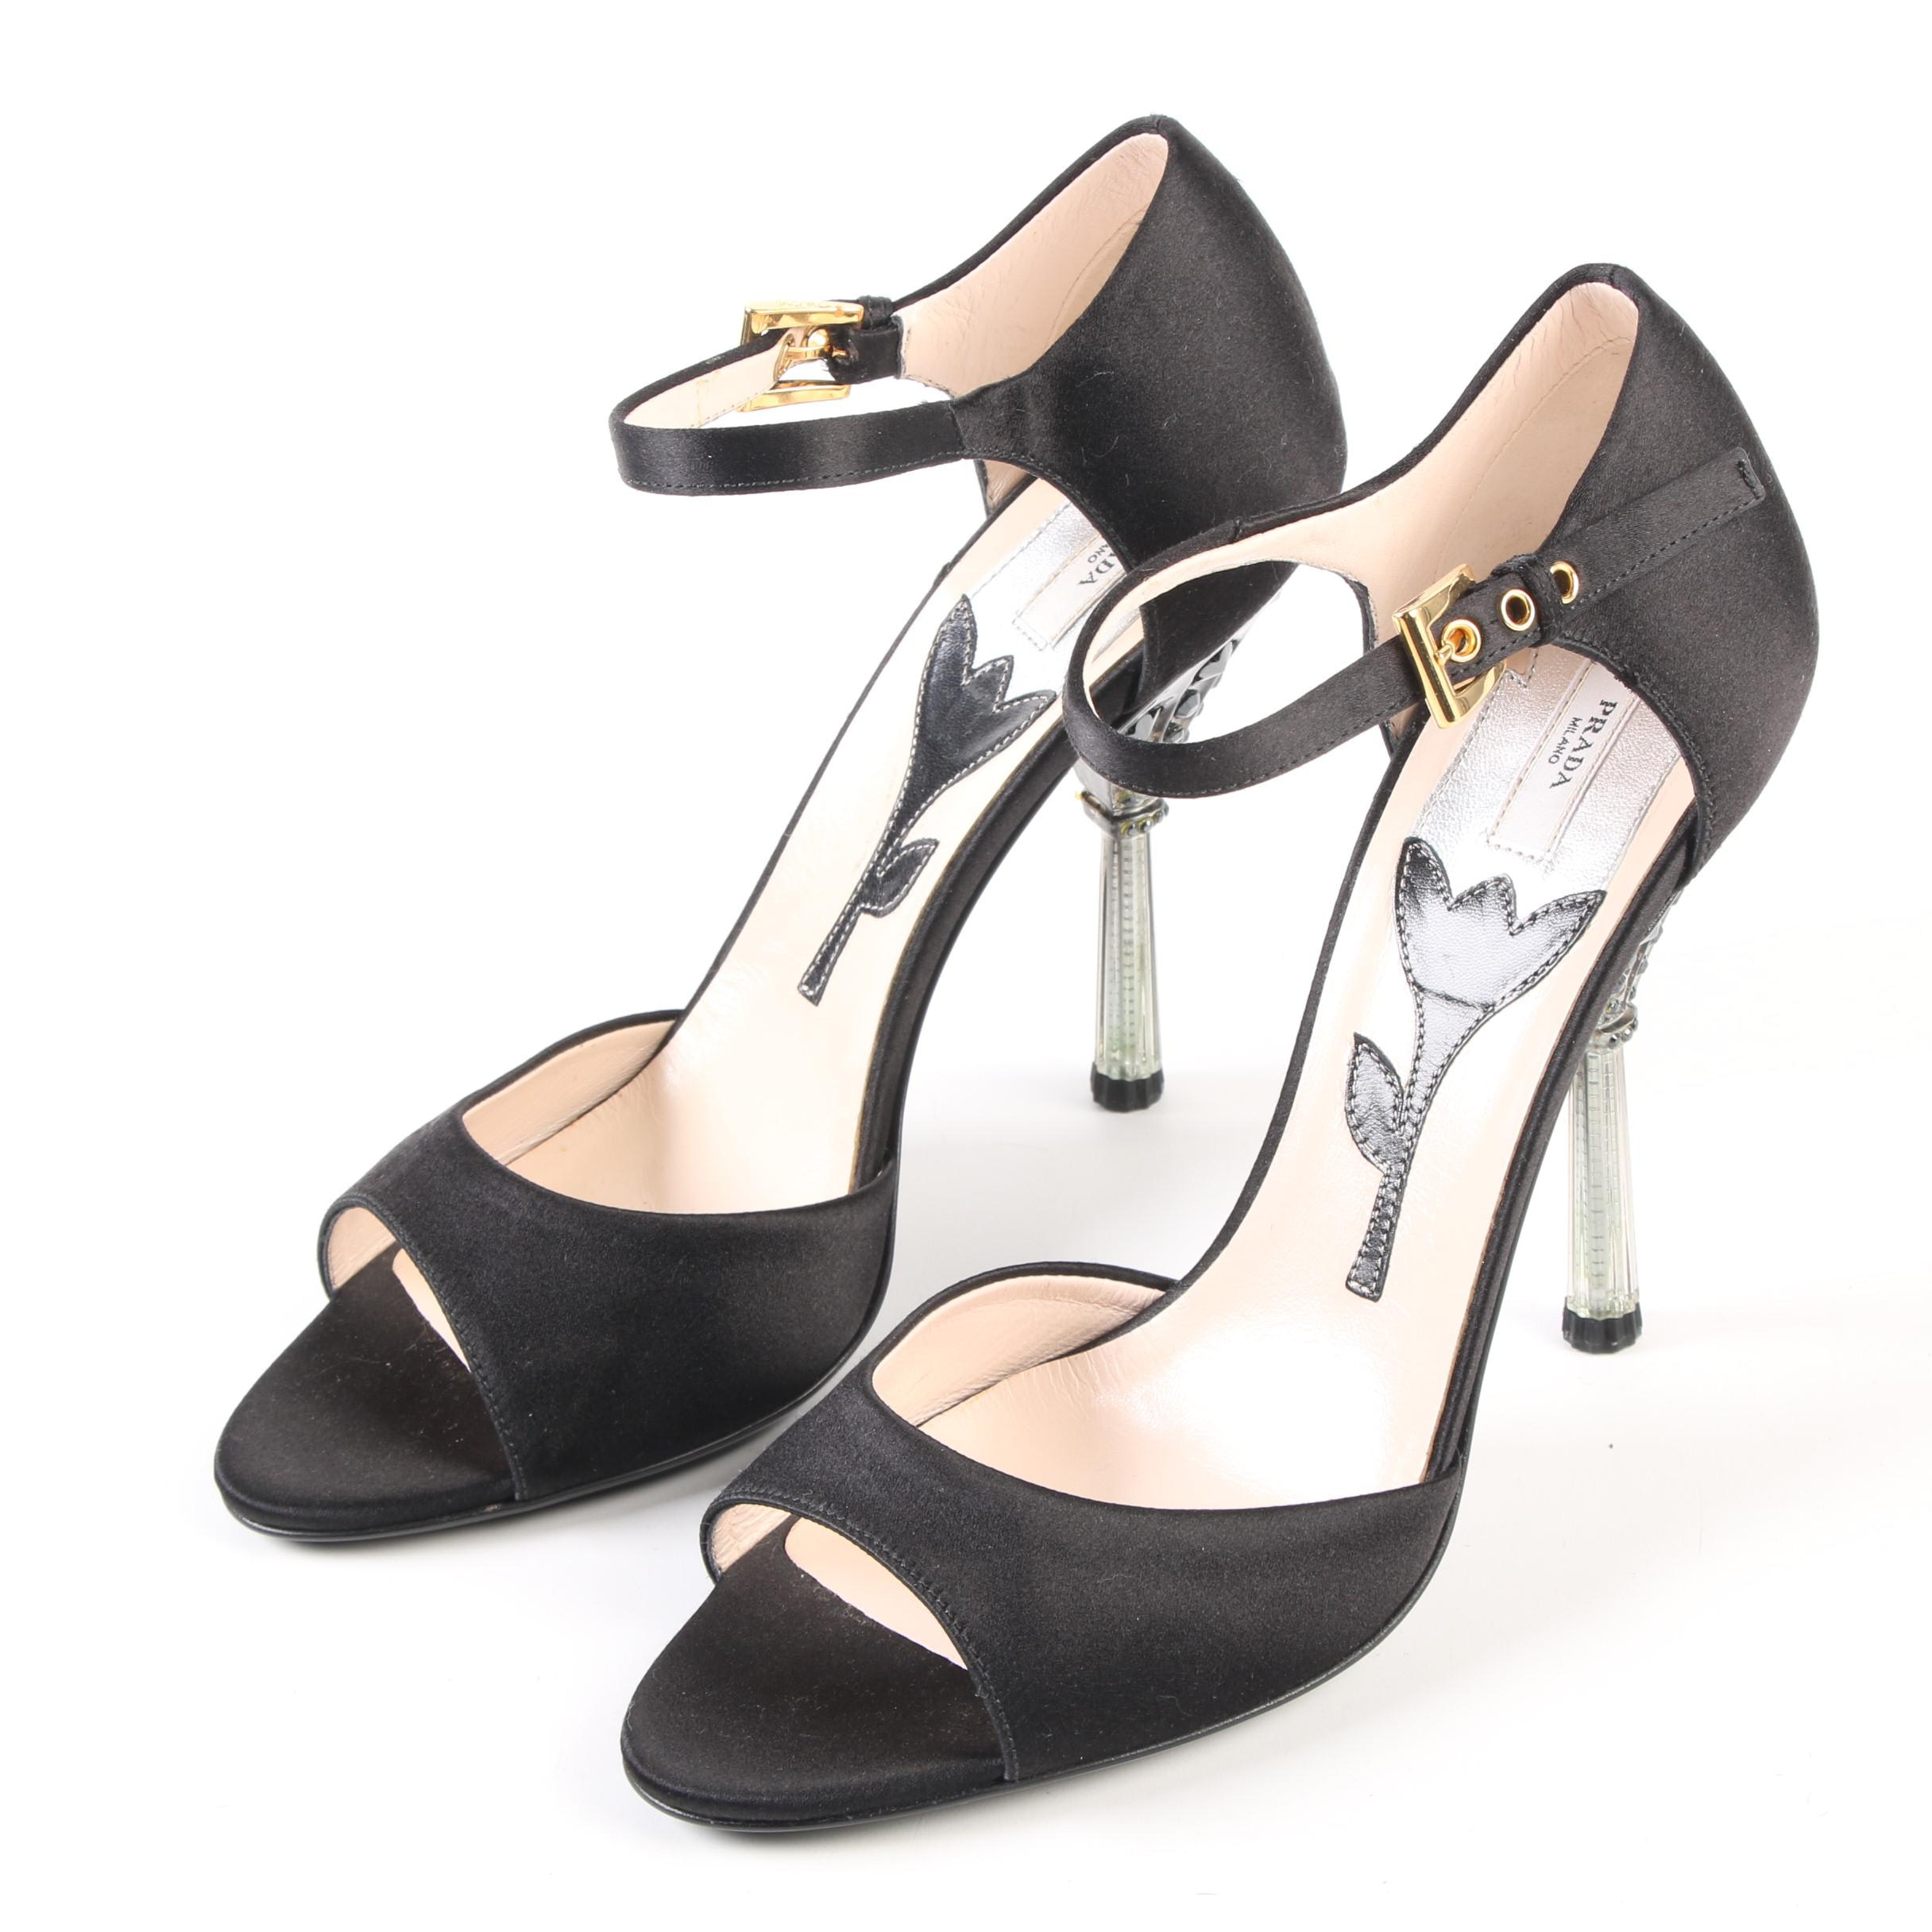 Prada Raso Jewels Black Satin Ankle Strap Open Toe Sandals with Embellished Heel